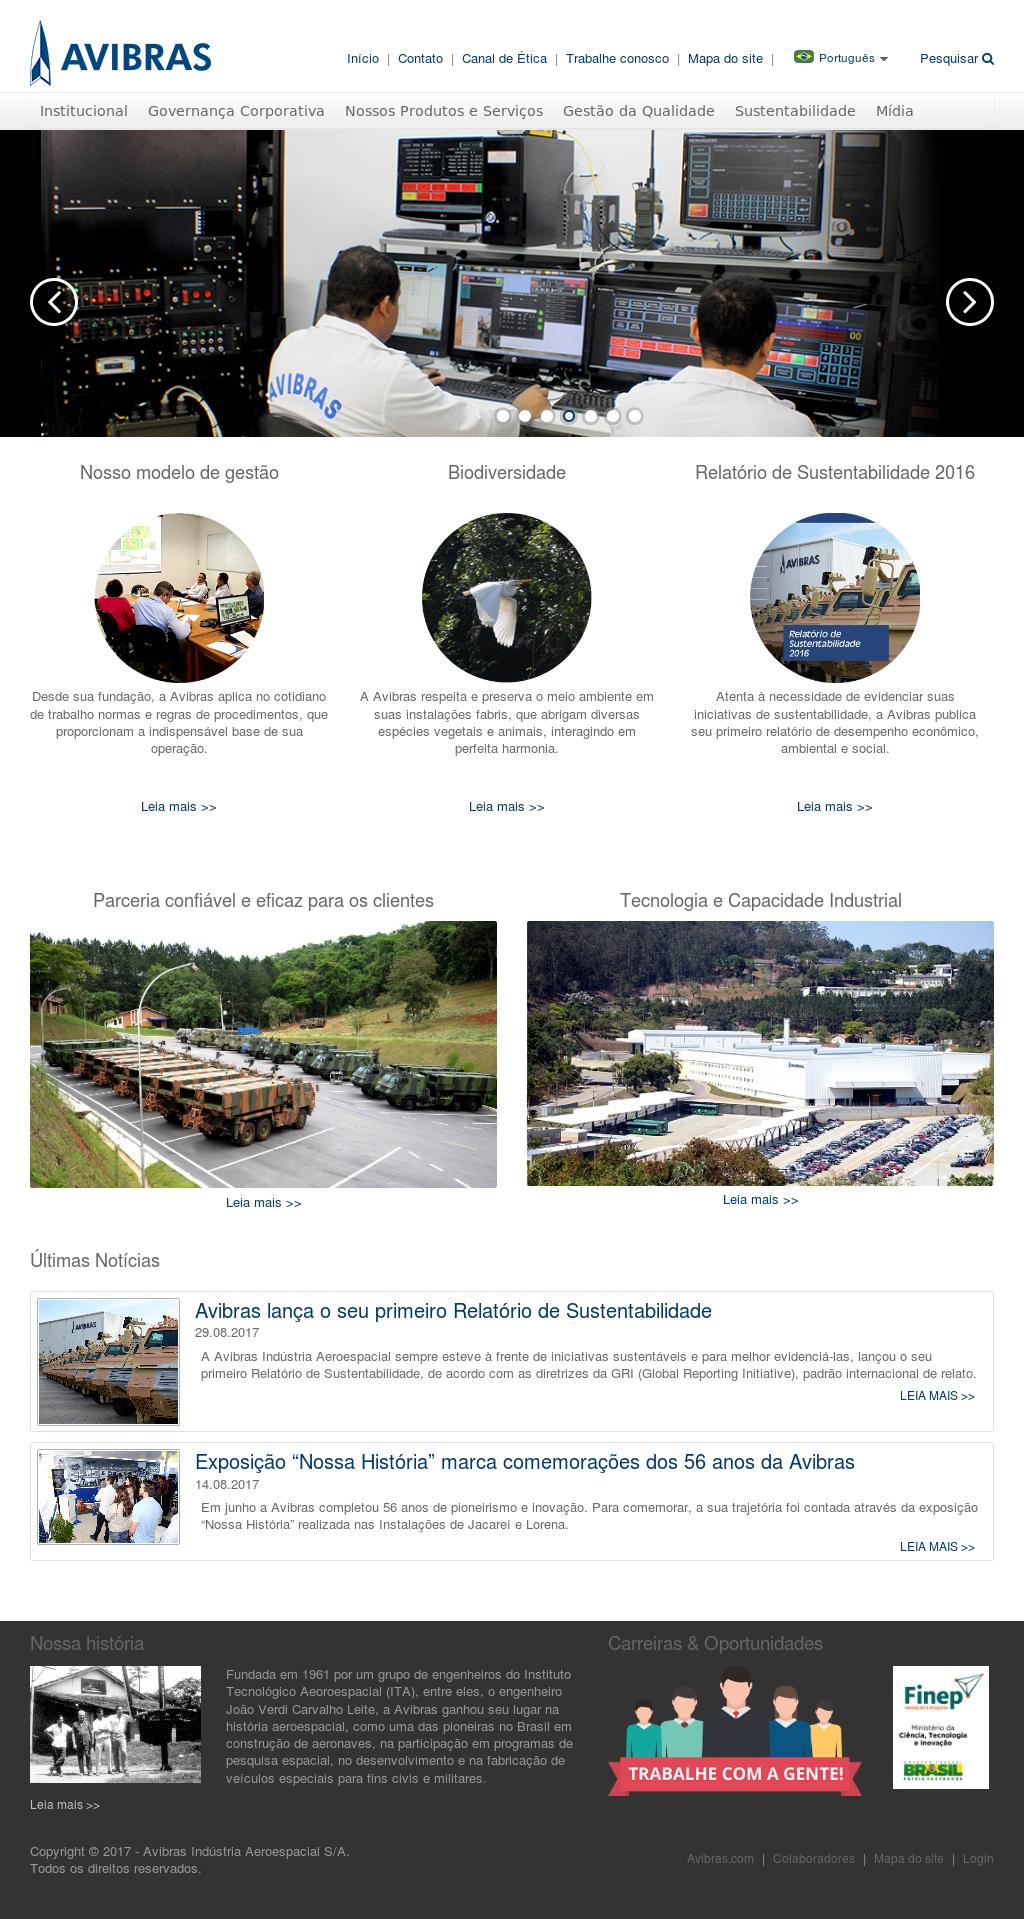 Avibras Indústria Competitors, Revenue and Employees